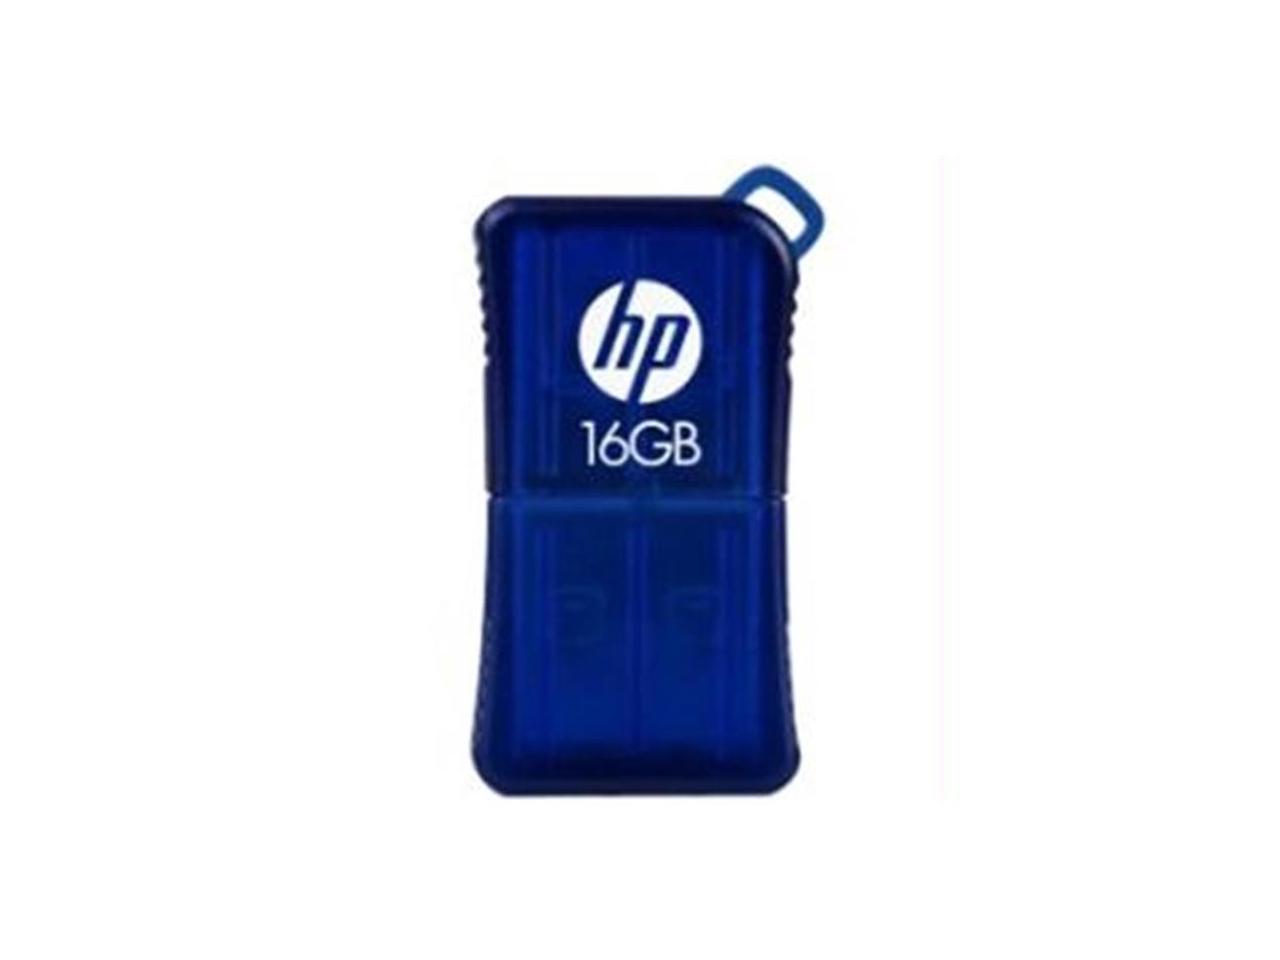 USB памет HP V165W, USB 2.0, 16GB, Син